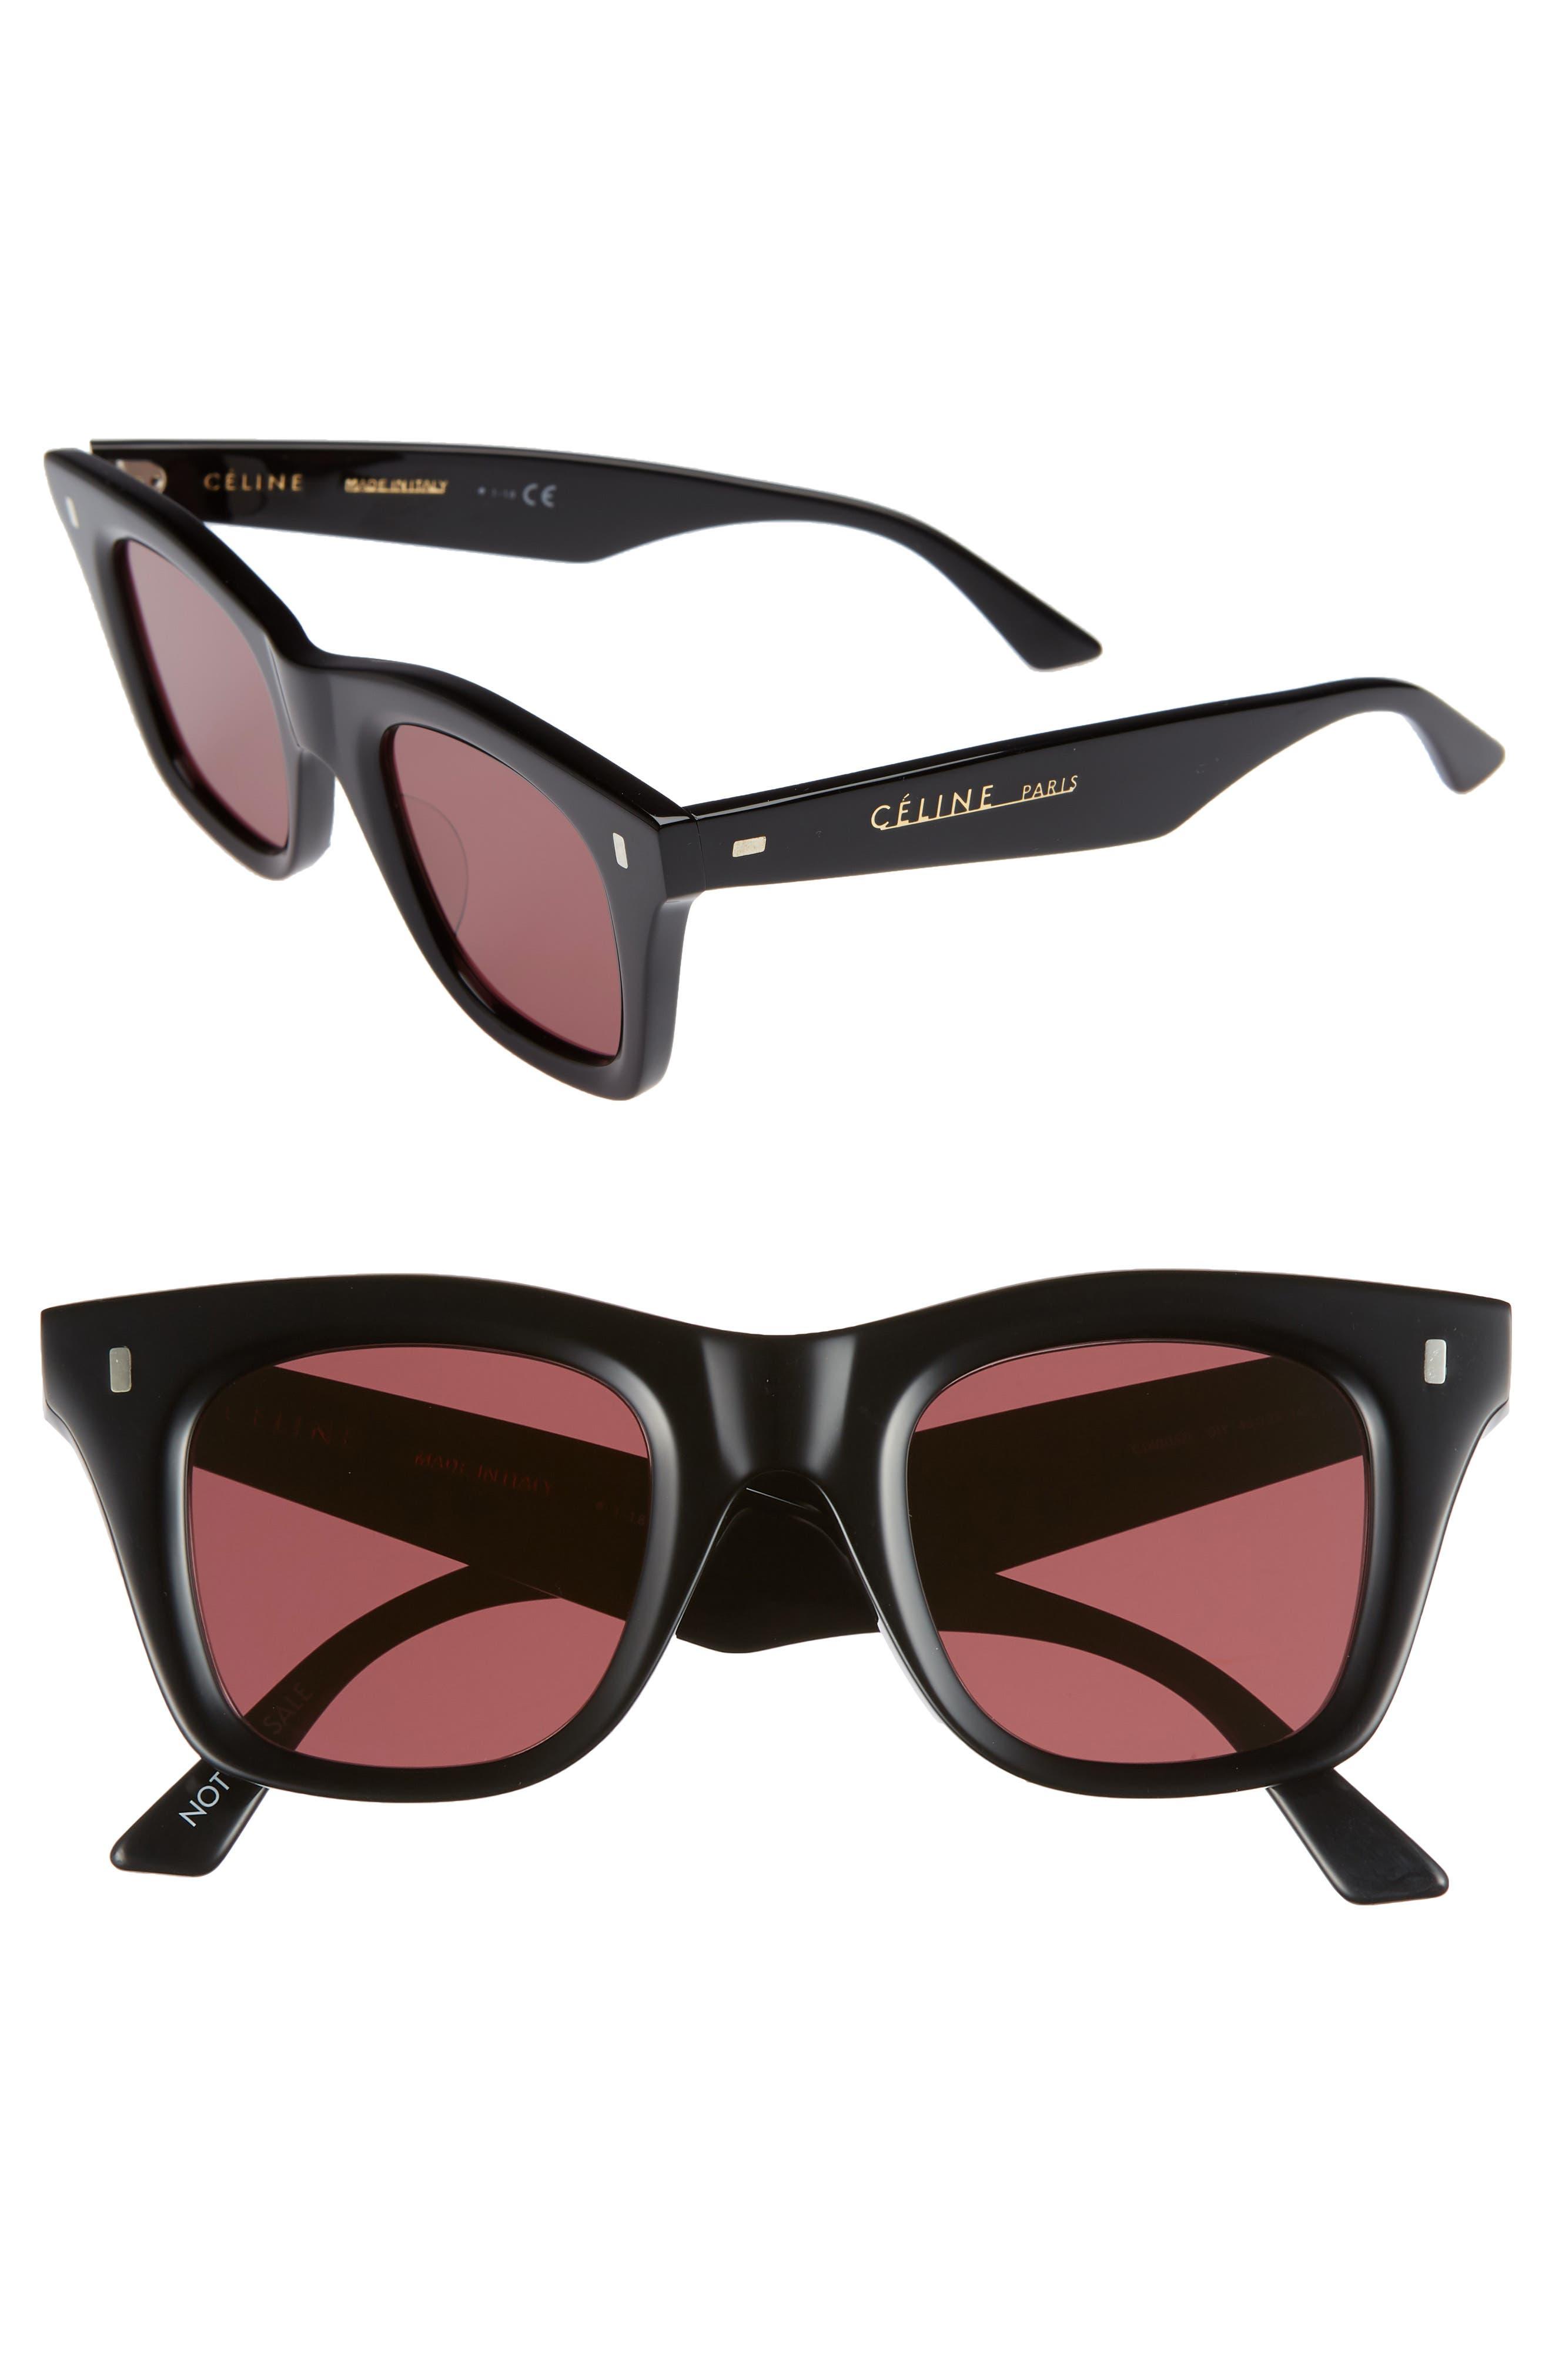 46Mm Square Sunglasses - Black